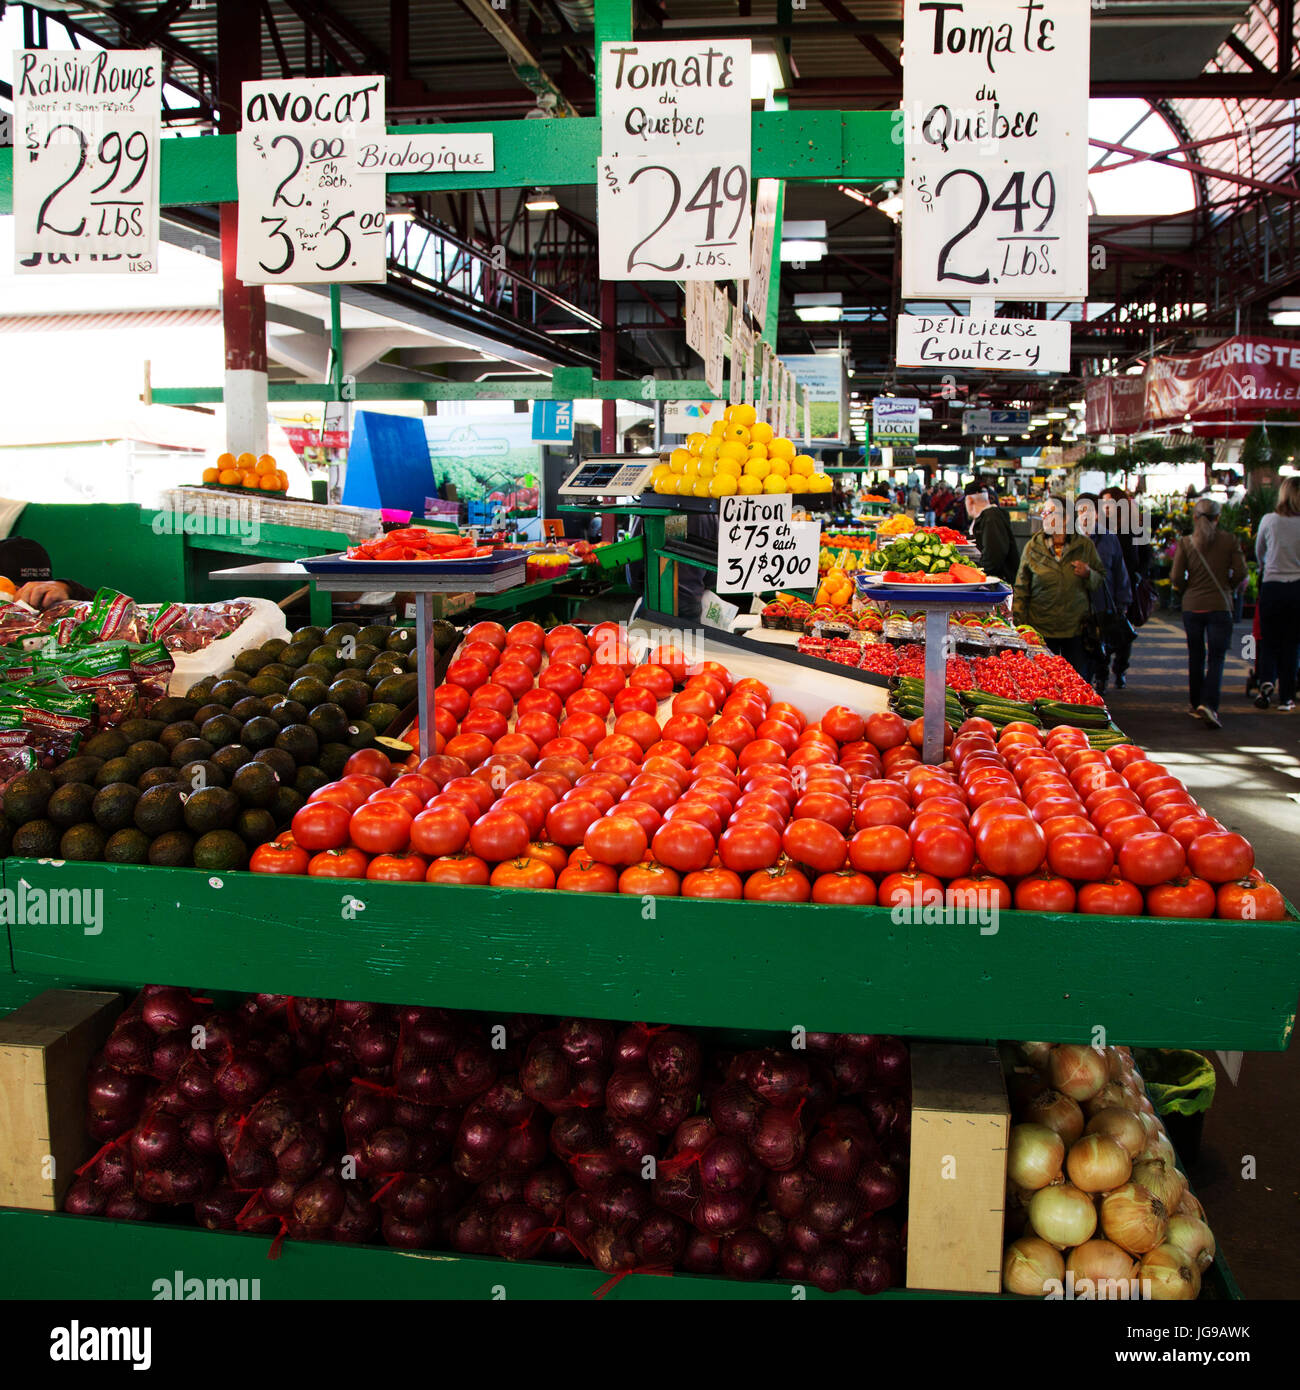 Kitchen Gallery Jean Talon: Marche Jean Talon Market Photos & Marche Jean Talon Market